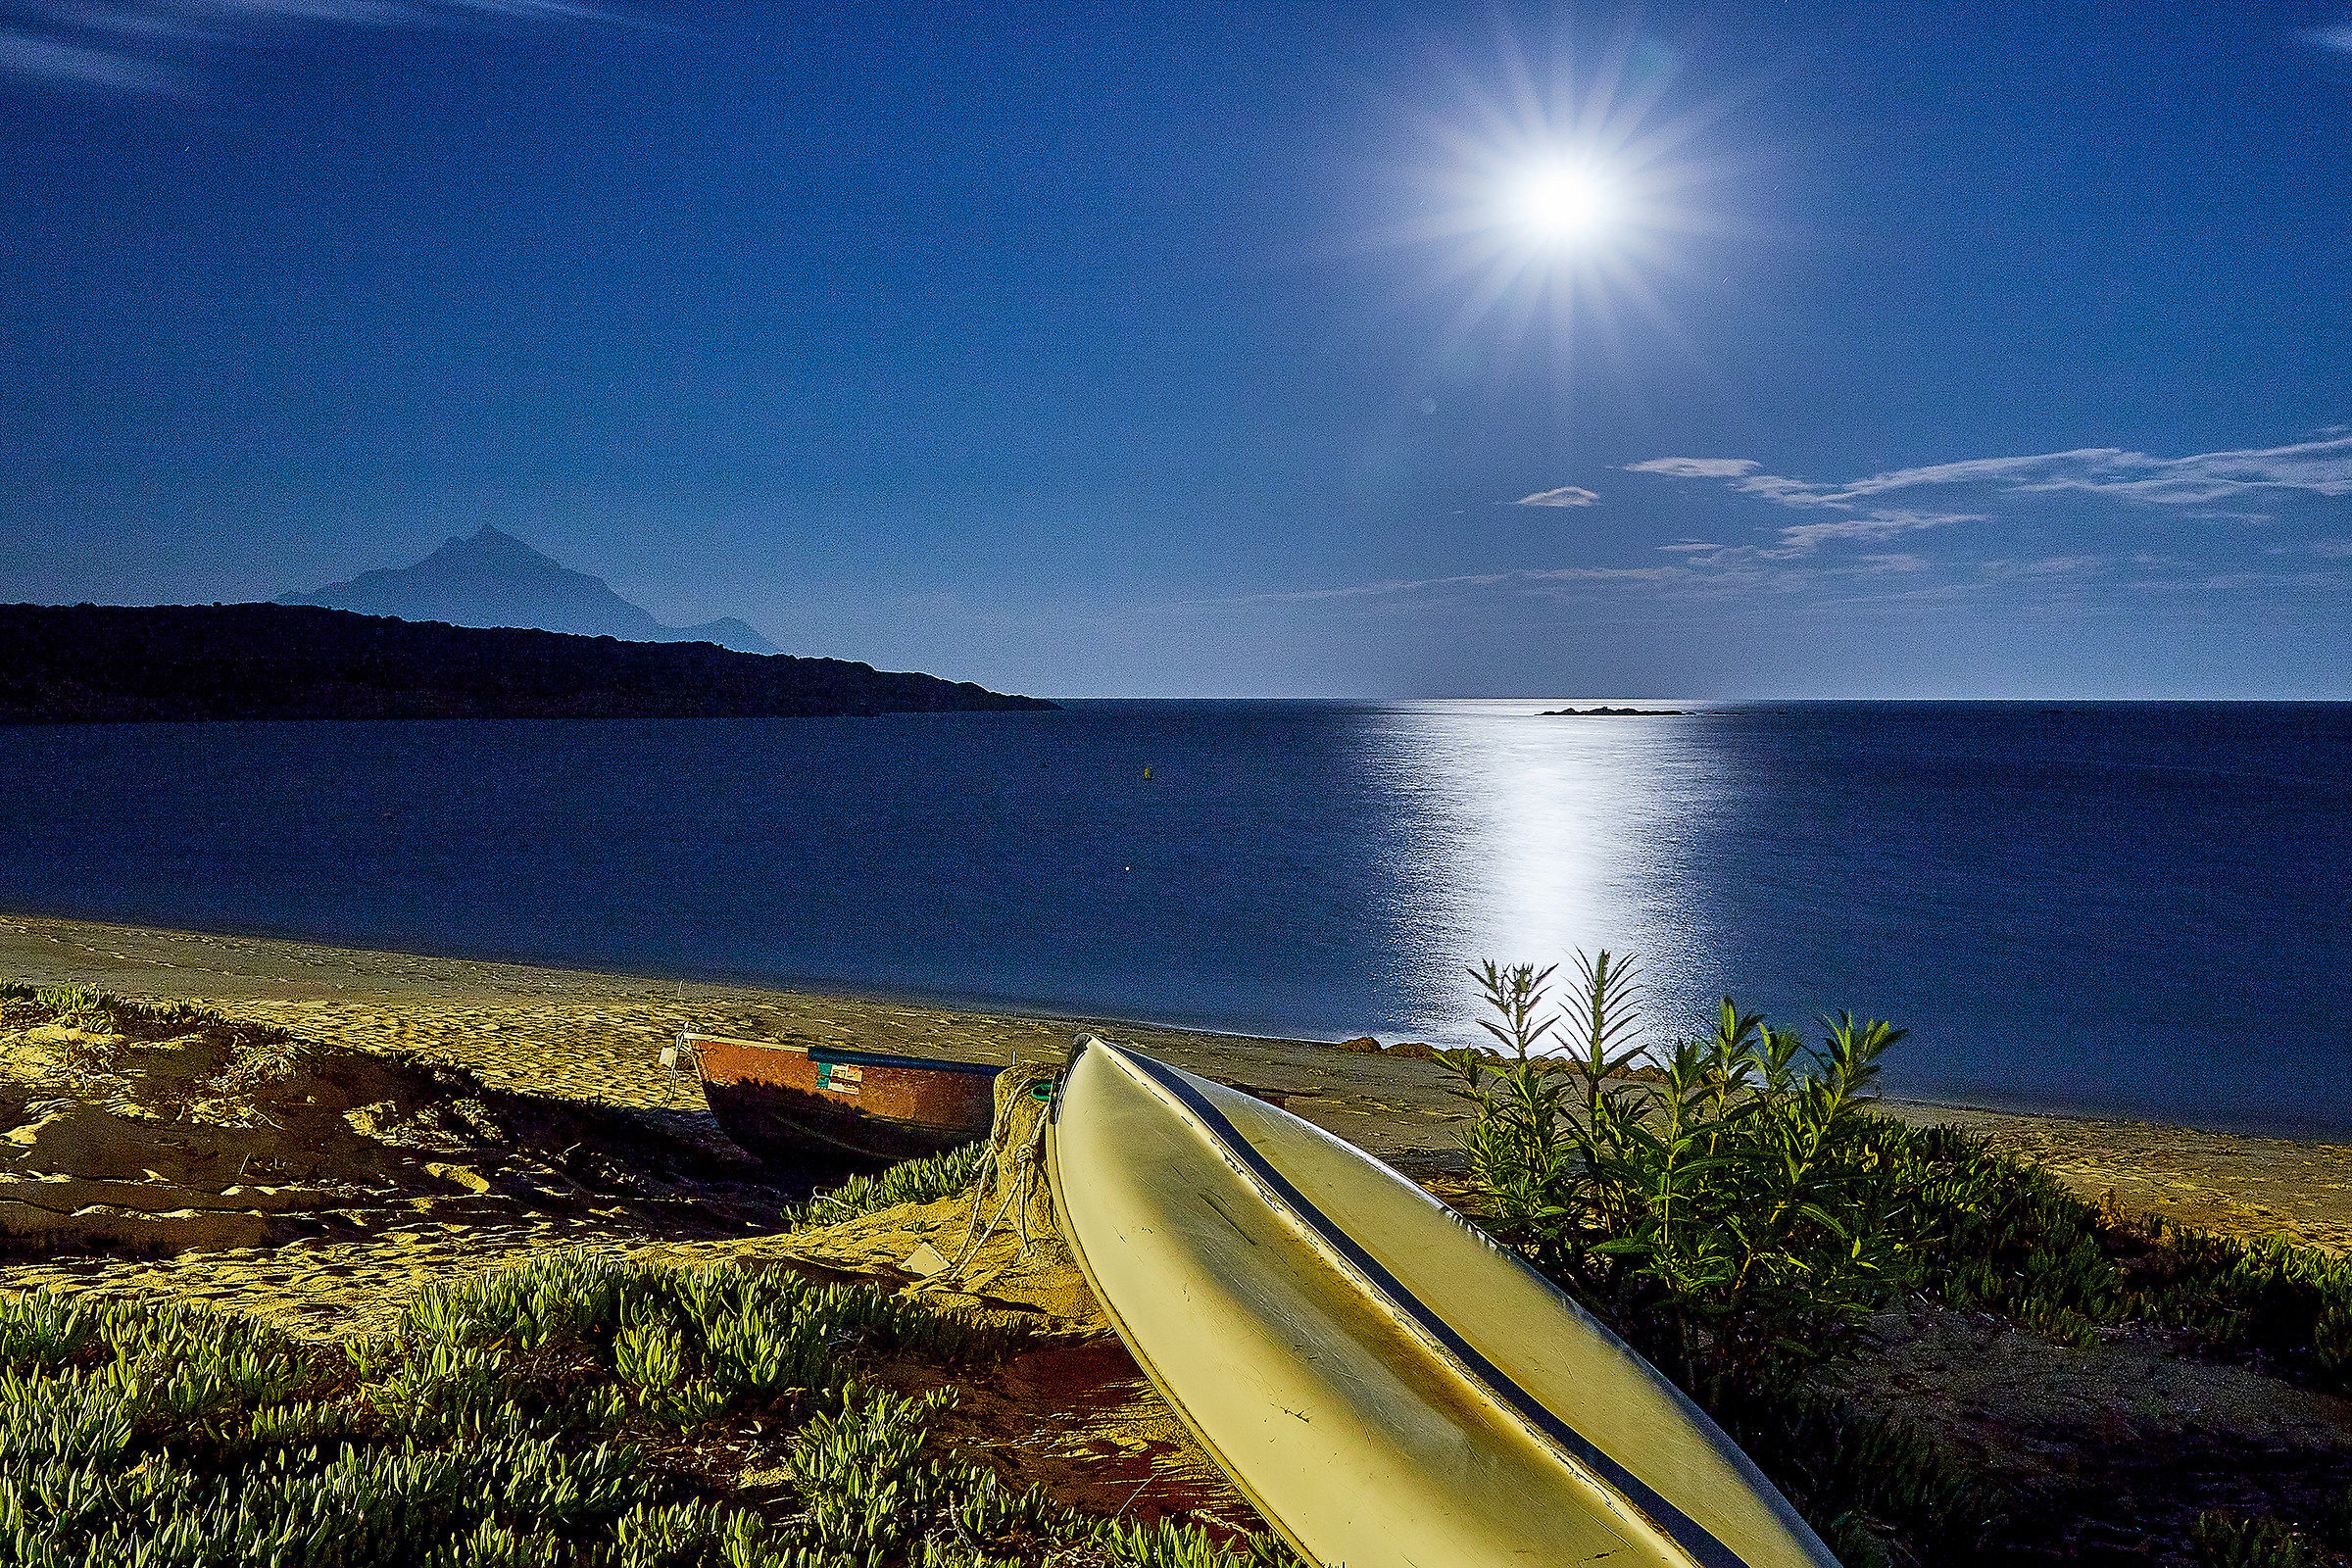 Day or night? Mount Athos, (Chalkidiki-Greece)...